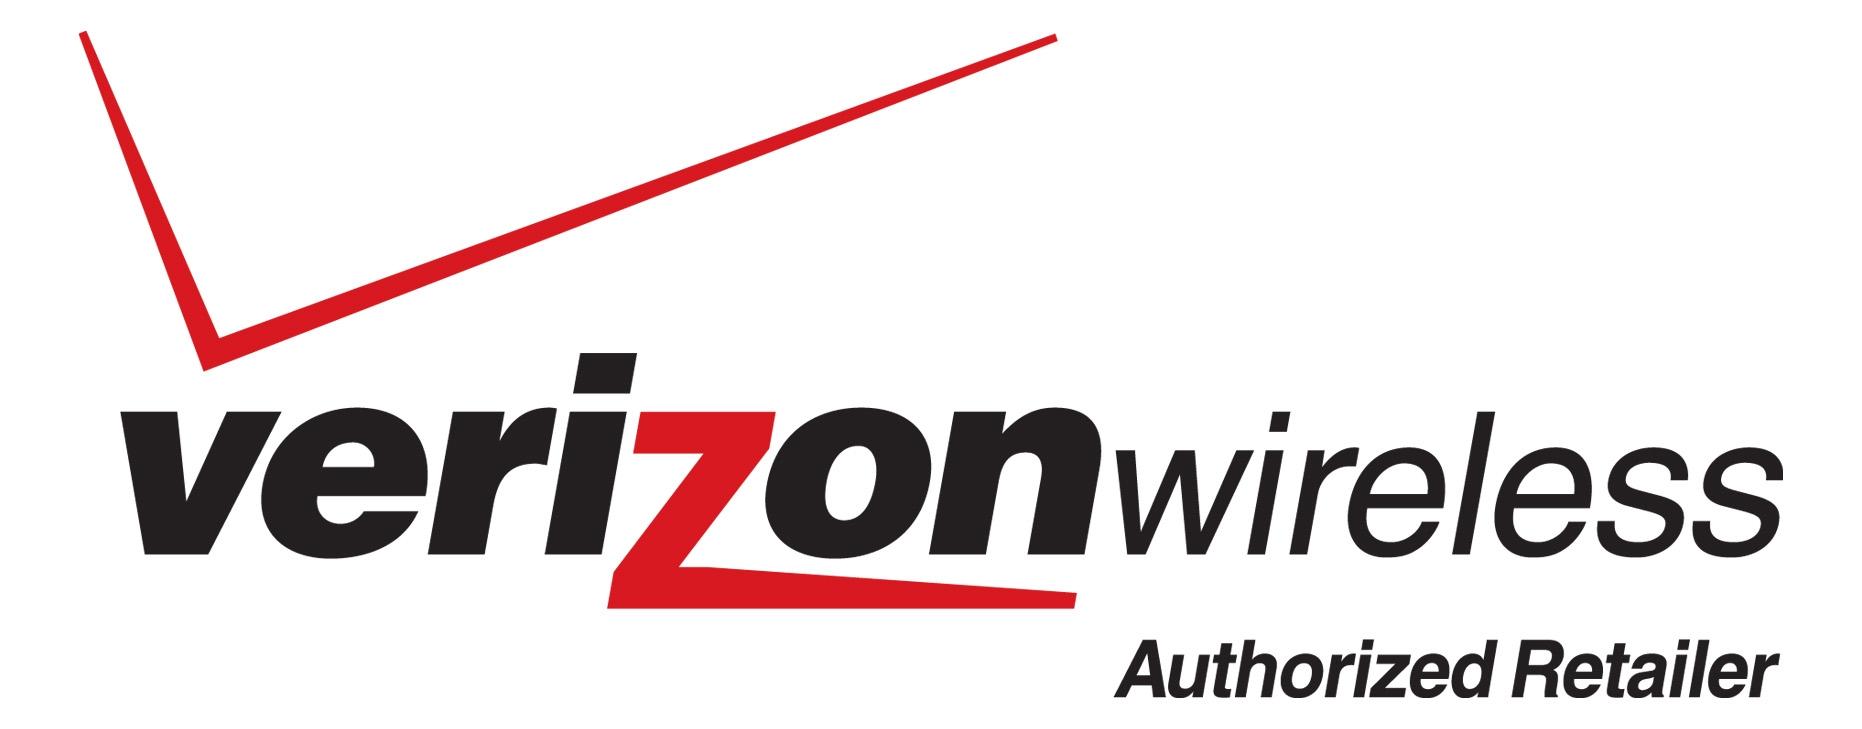 Verizon Wireless Retail Locations Open Inside BJ'S Wholesale